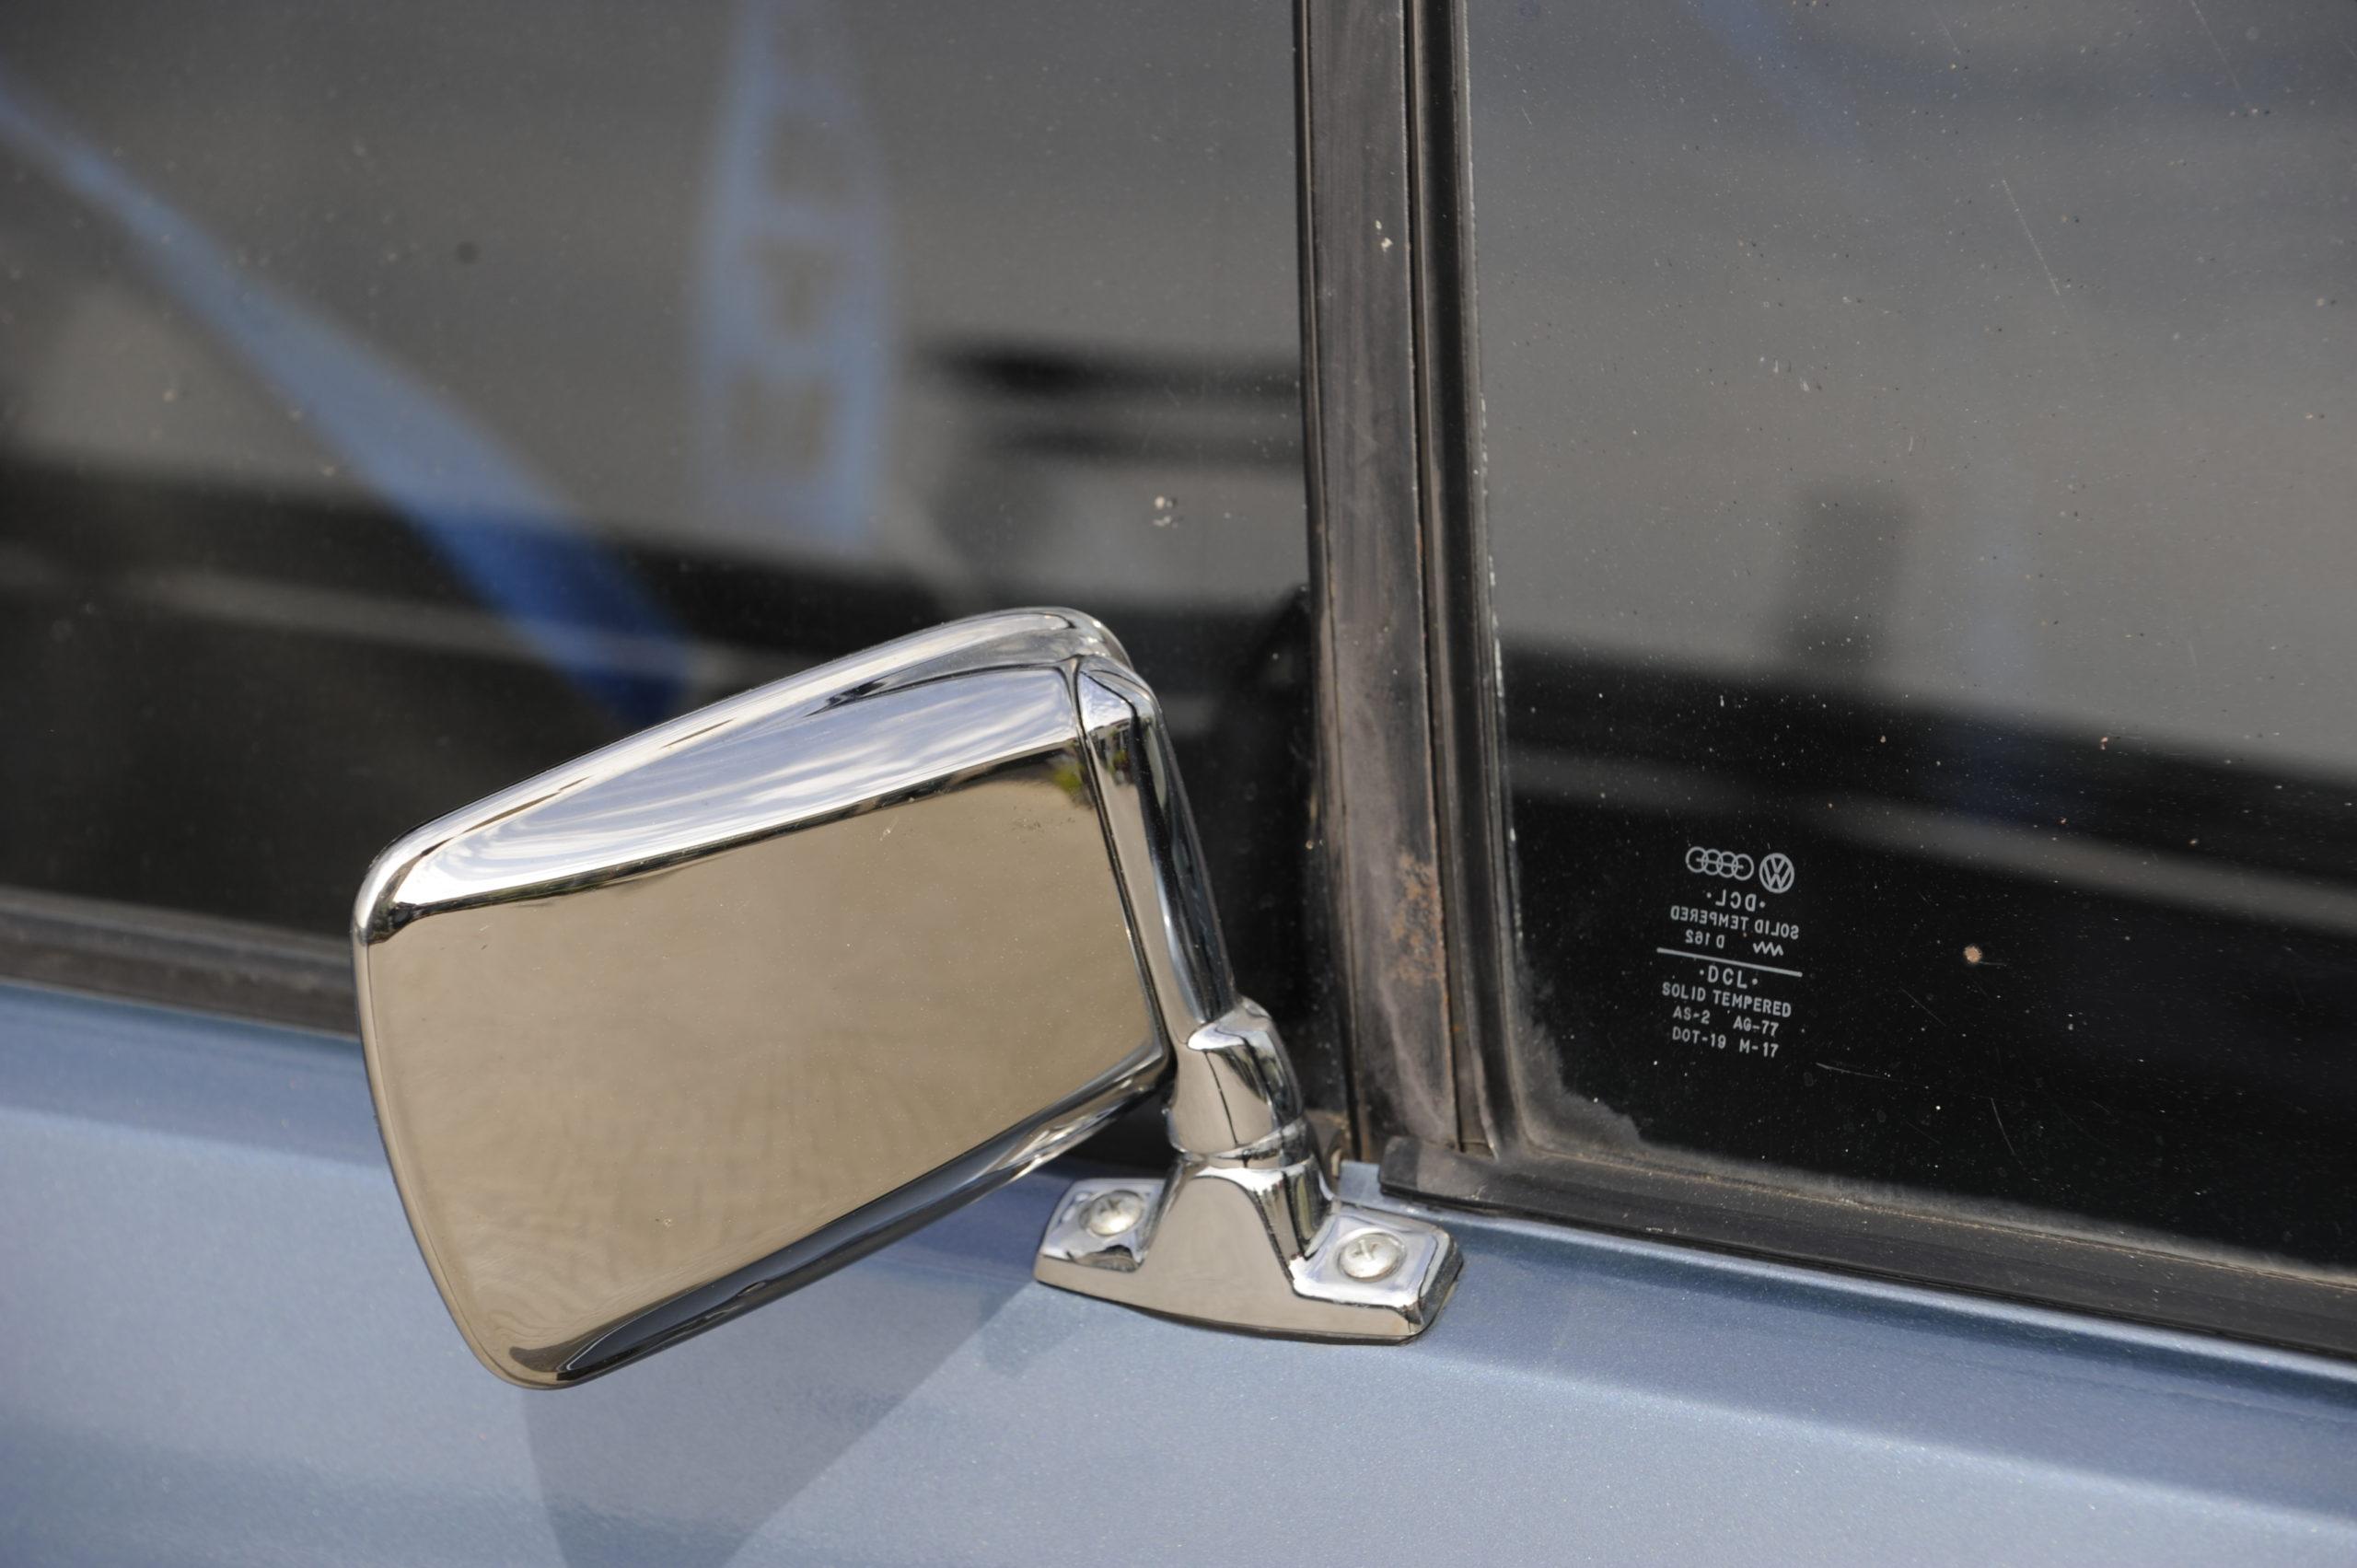 Tuning-VW-Caddy-1-R32-chromowane lusterko boczne